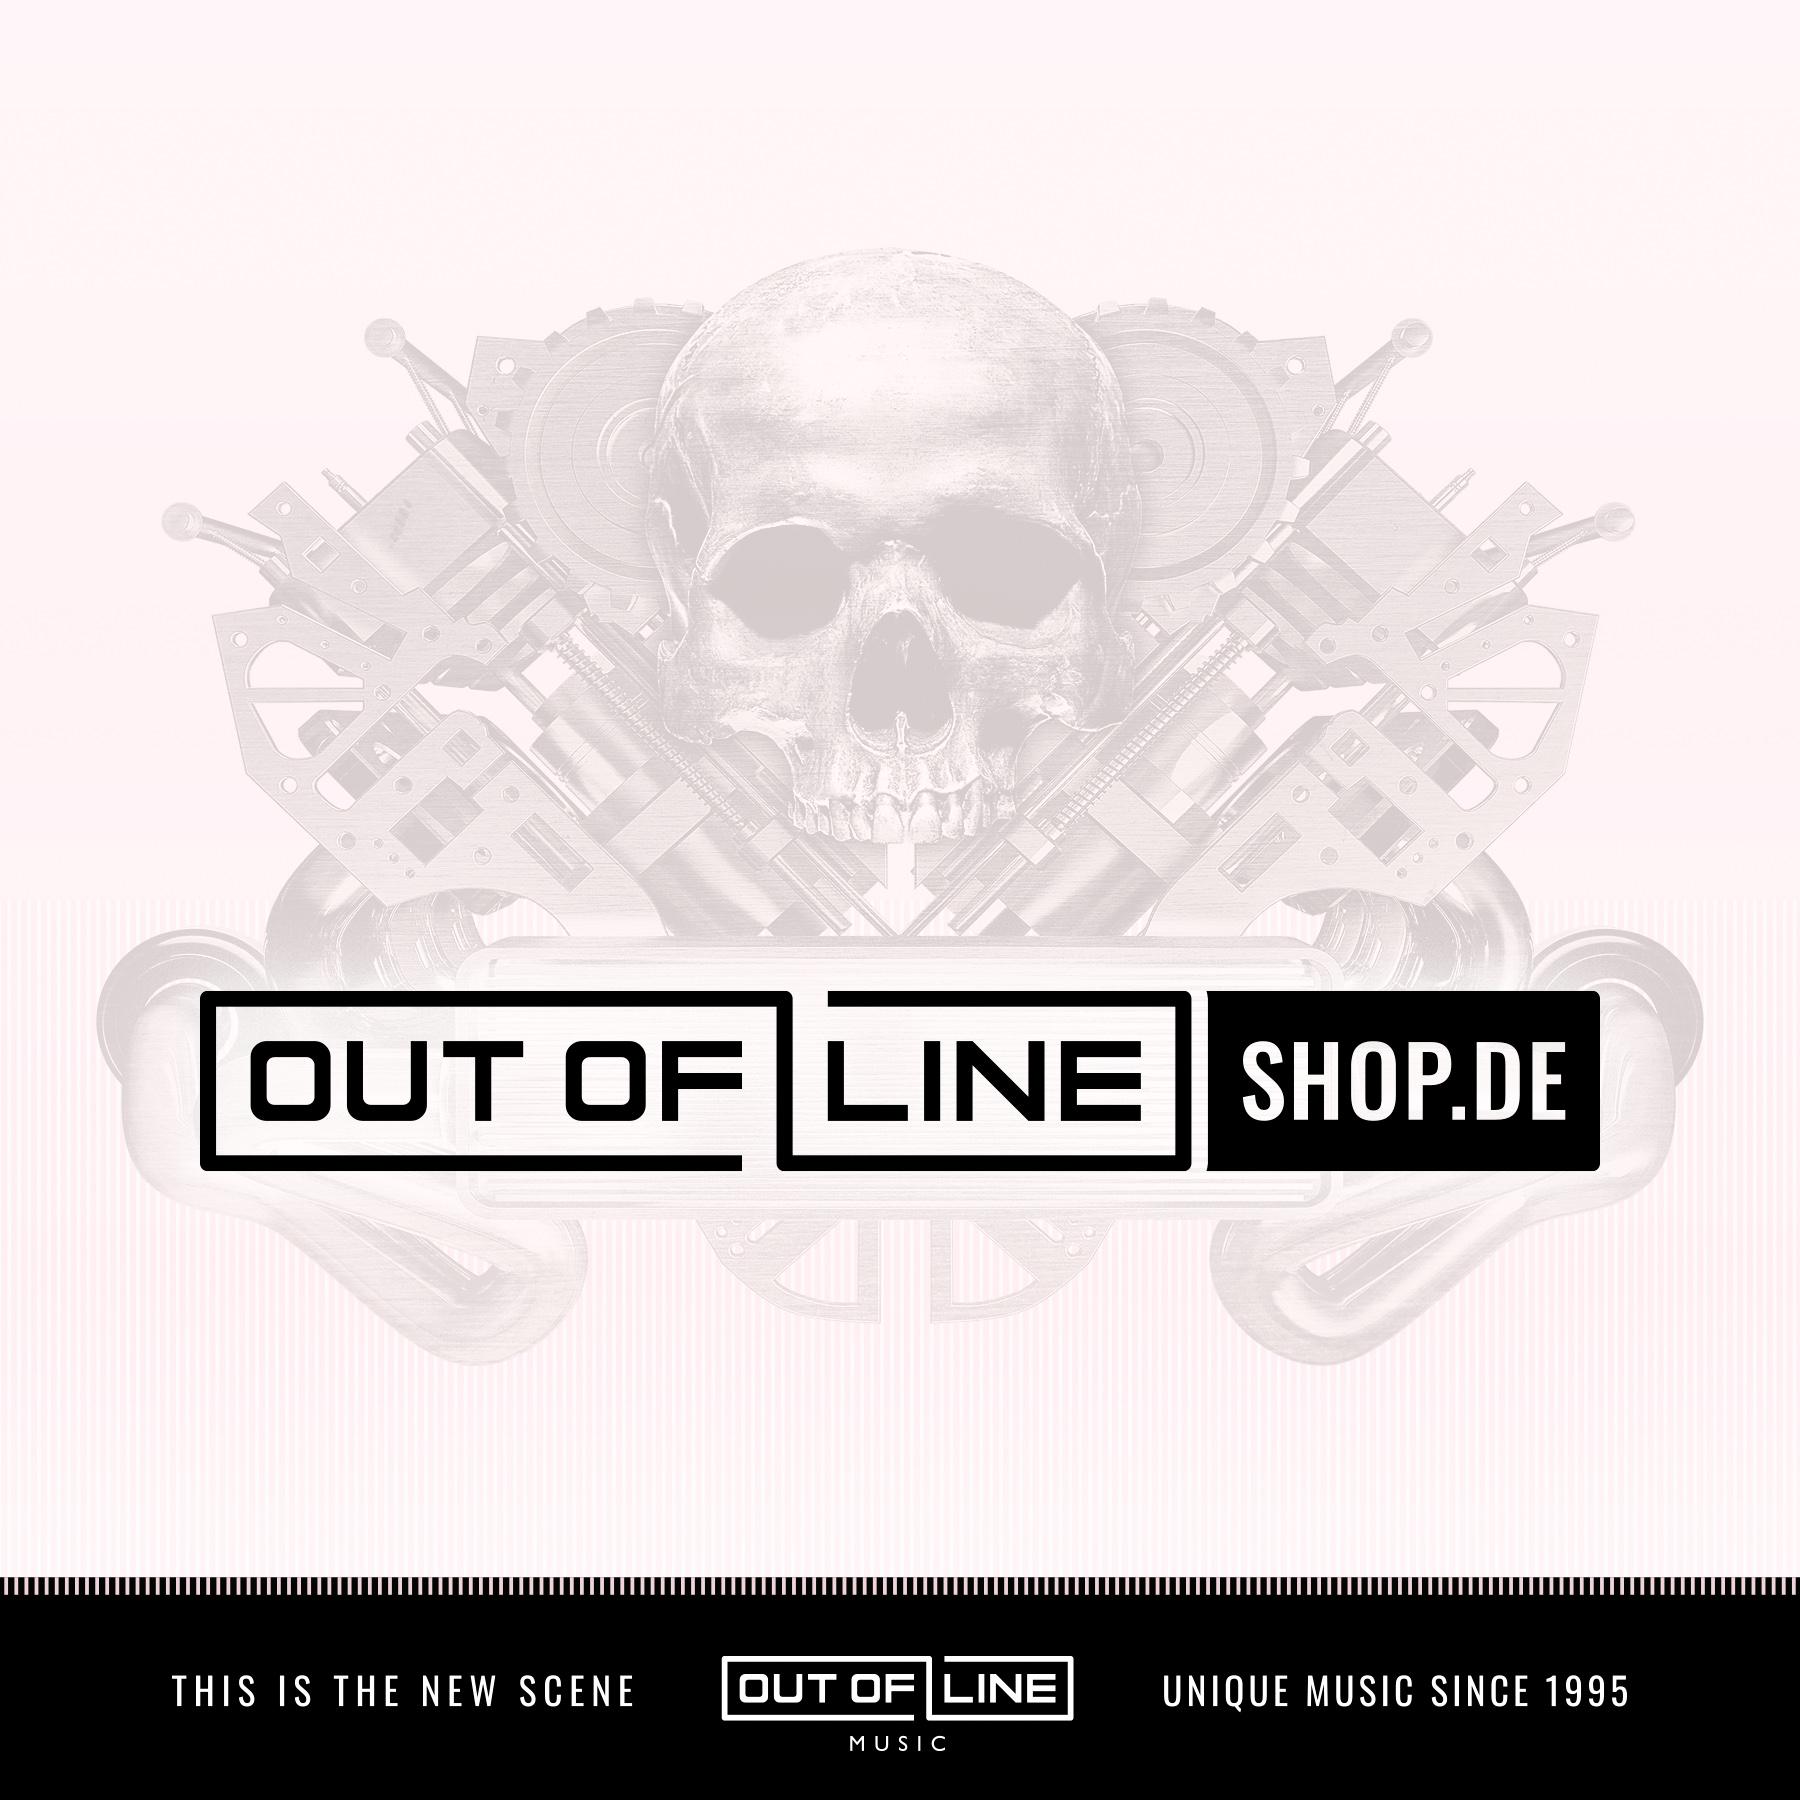 Blutengel - Logo (Flügel) s/w - Aufnäher/Patch